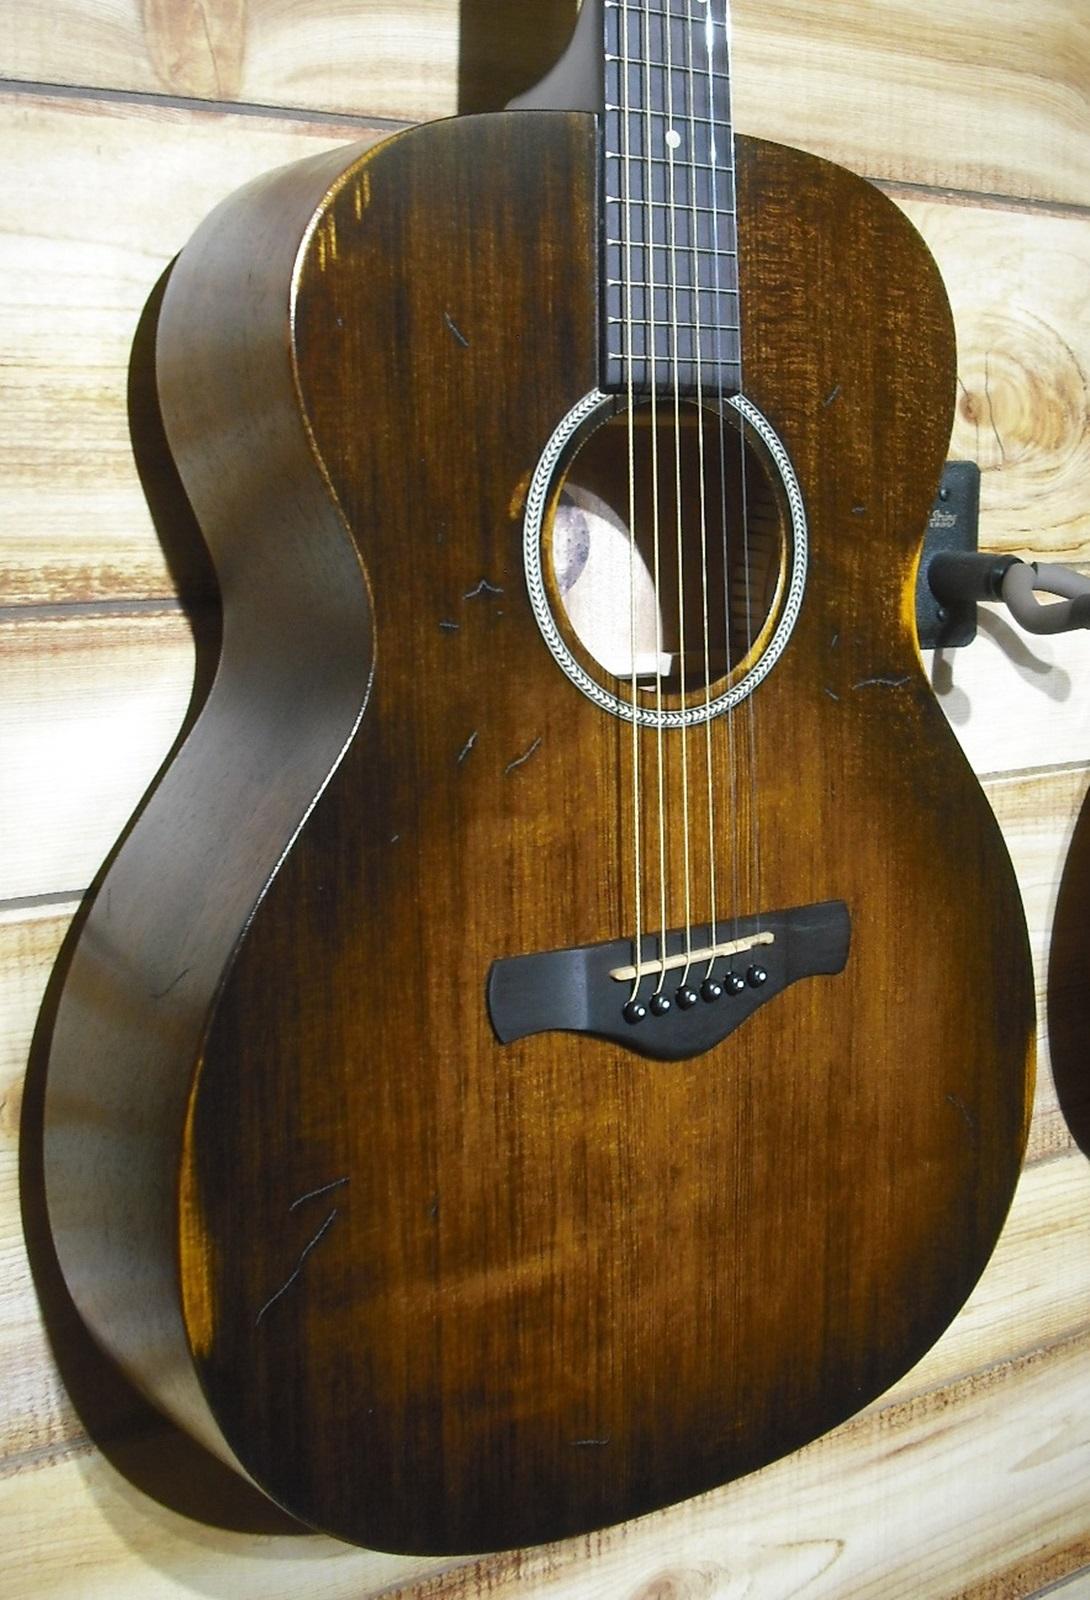 Ibanez AVC6 Grand Concert Acoustic Guitar Distressed Tobacco Sunburst